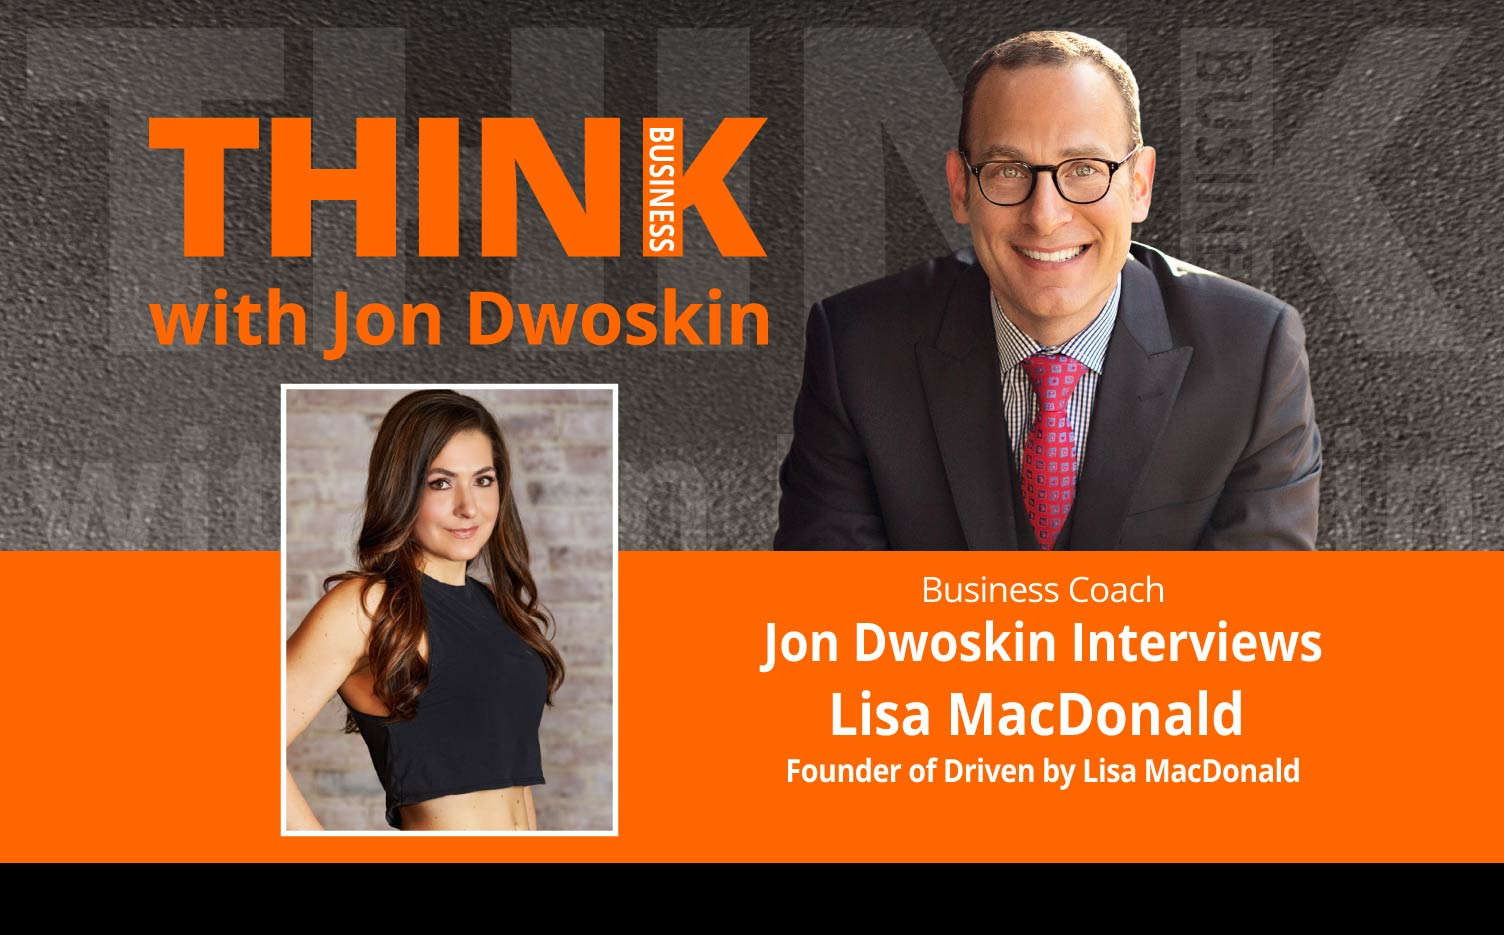 THINK Business Podcast: Jon Dwoskin Interviews Lisa MacDonald, Founder of Driven by Lisa MacDonald